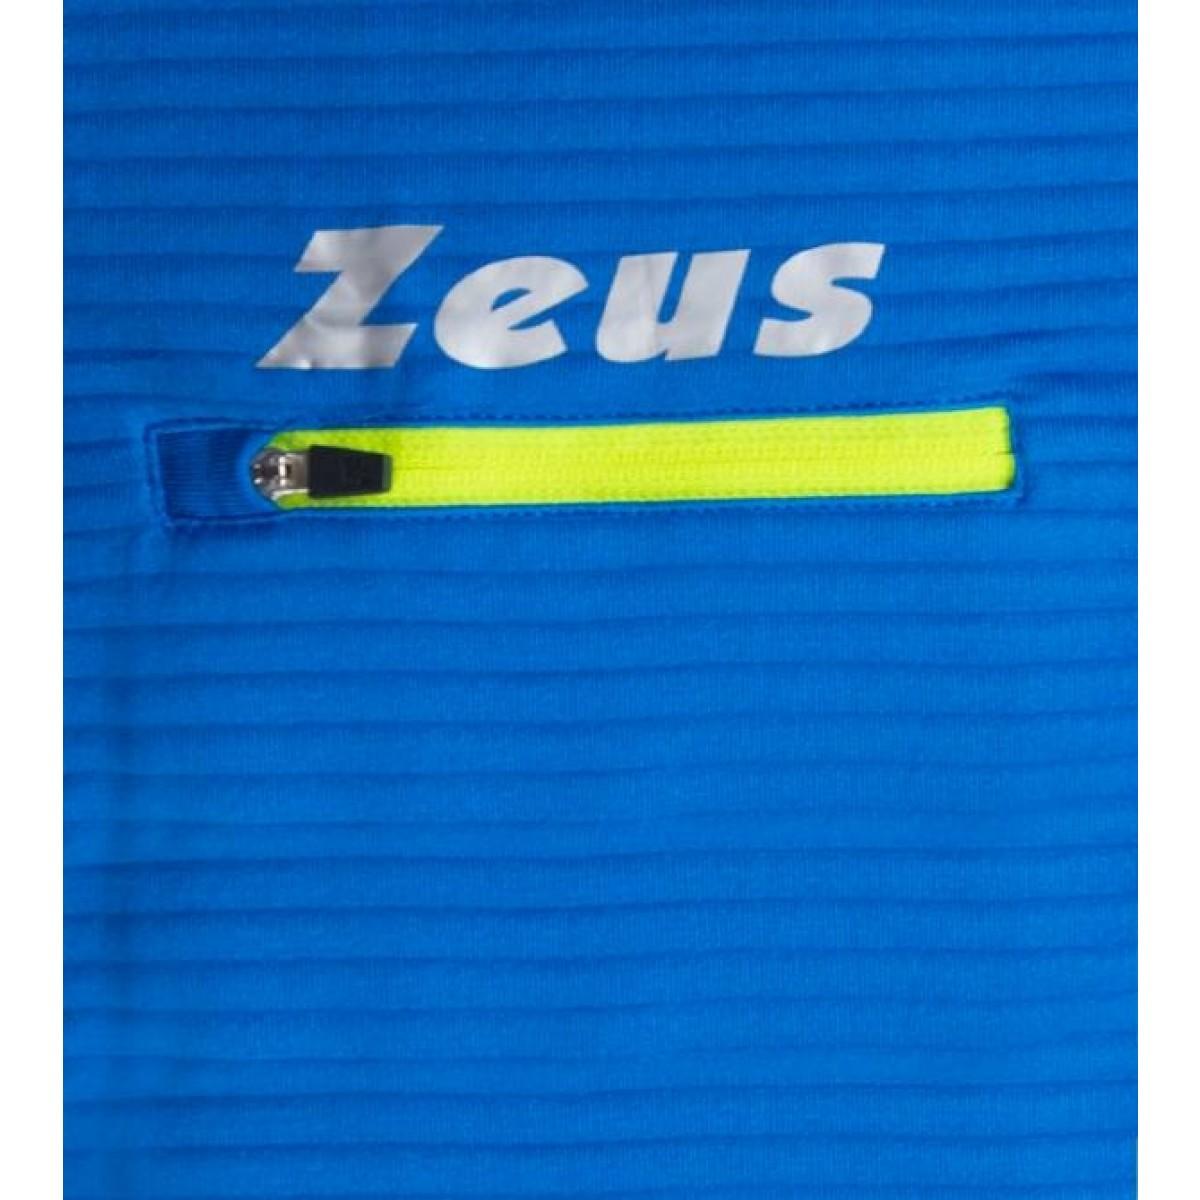 Zeus Atlante langaermet loebetroeje blaa neon gul hvid